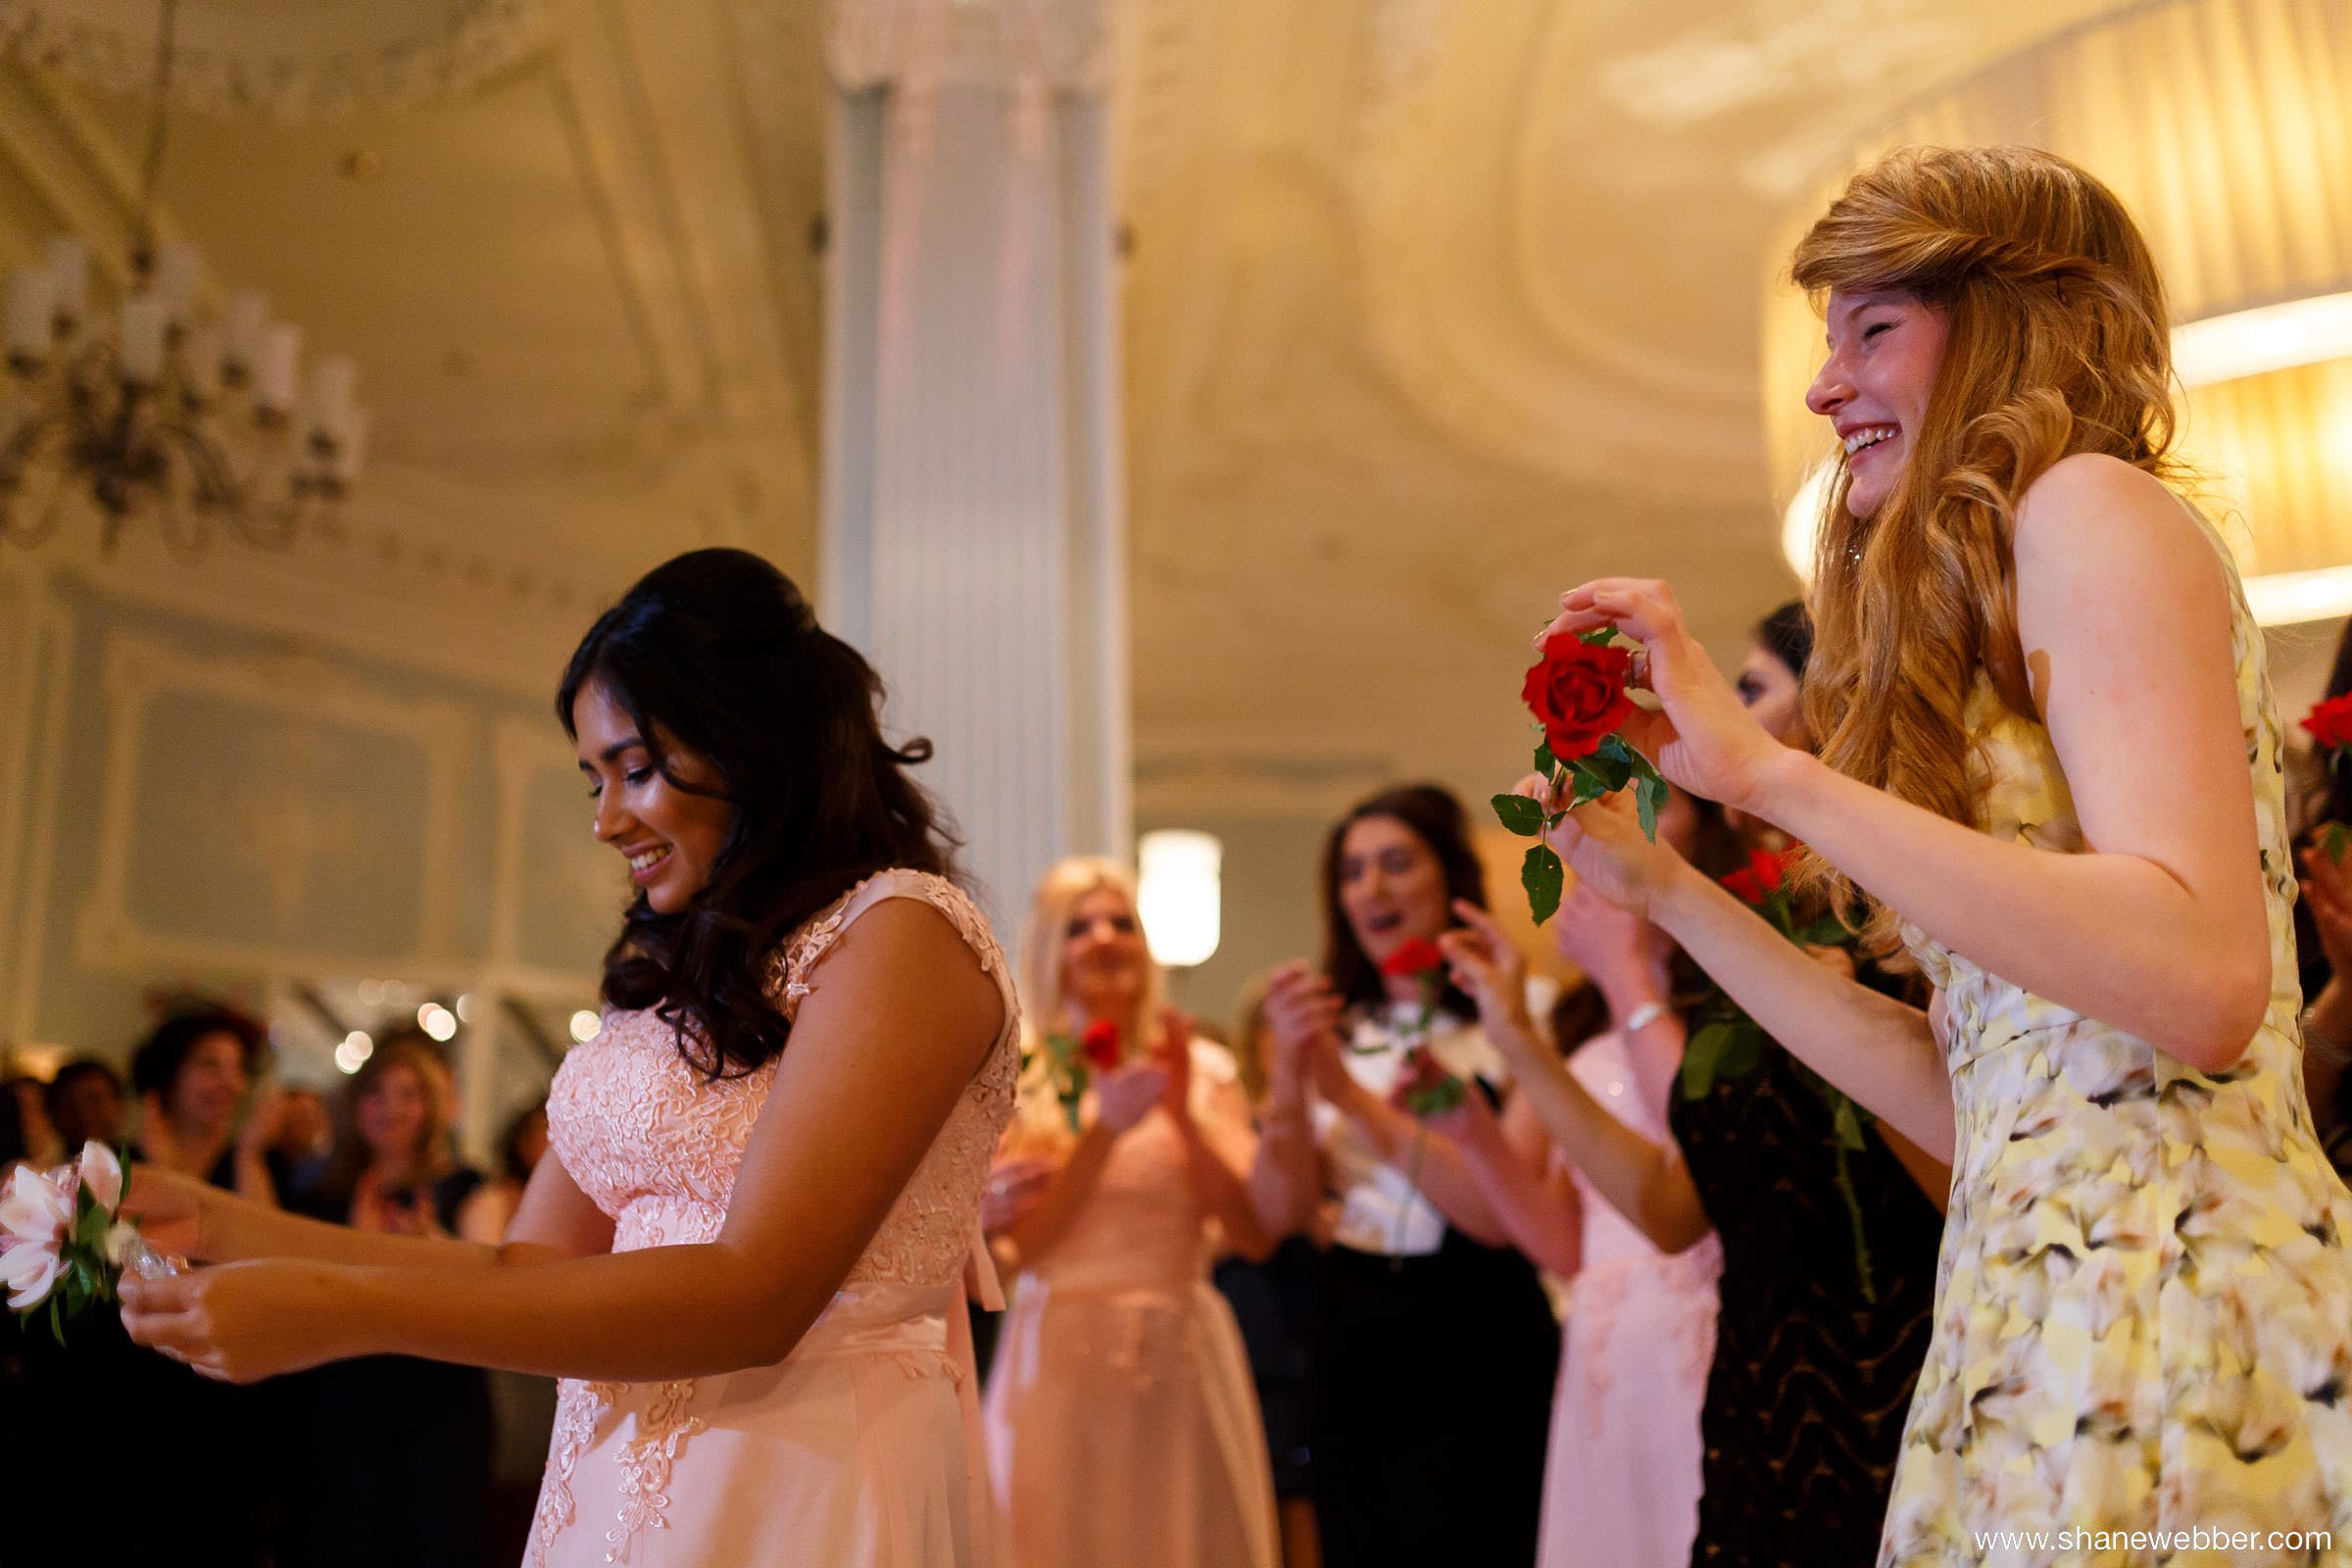 Knife dance at wedding